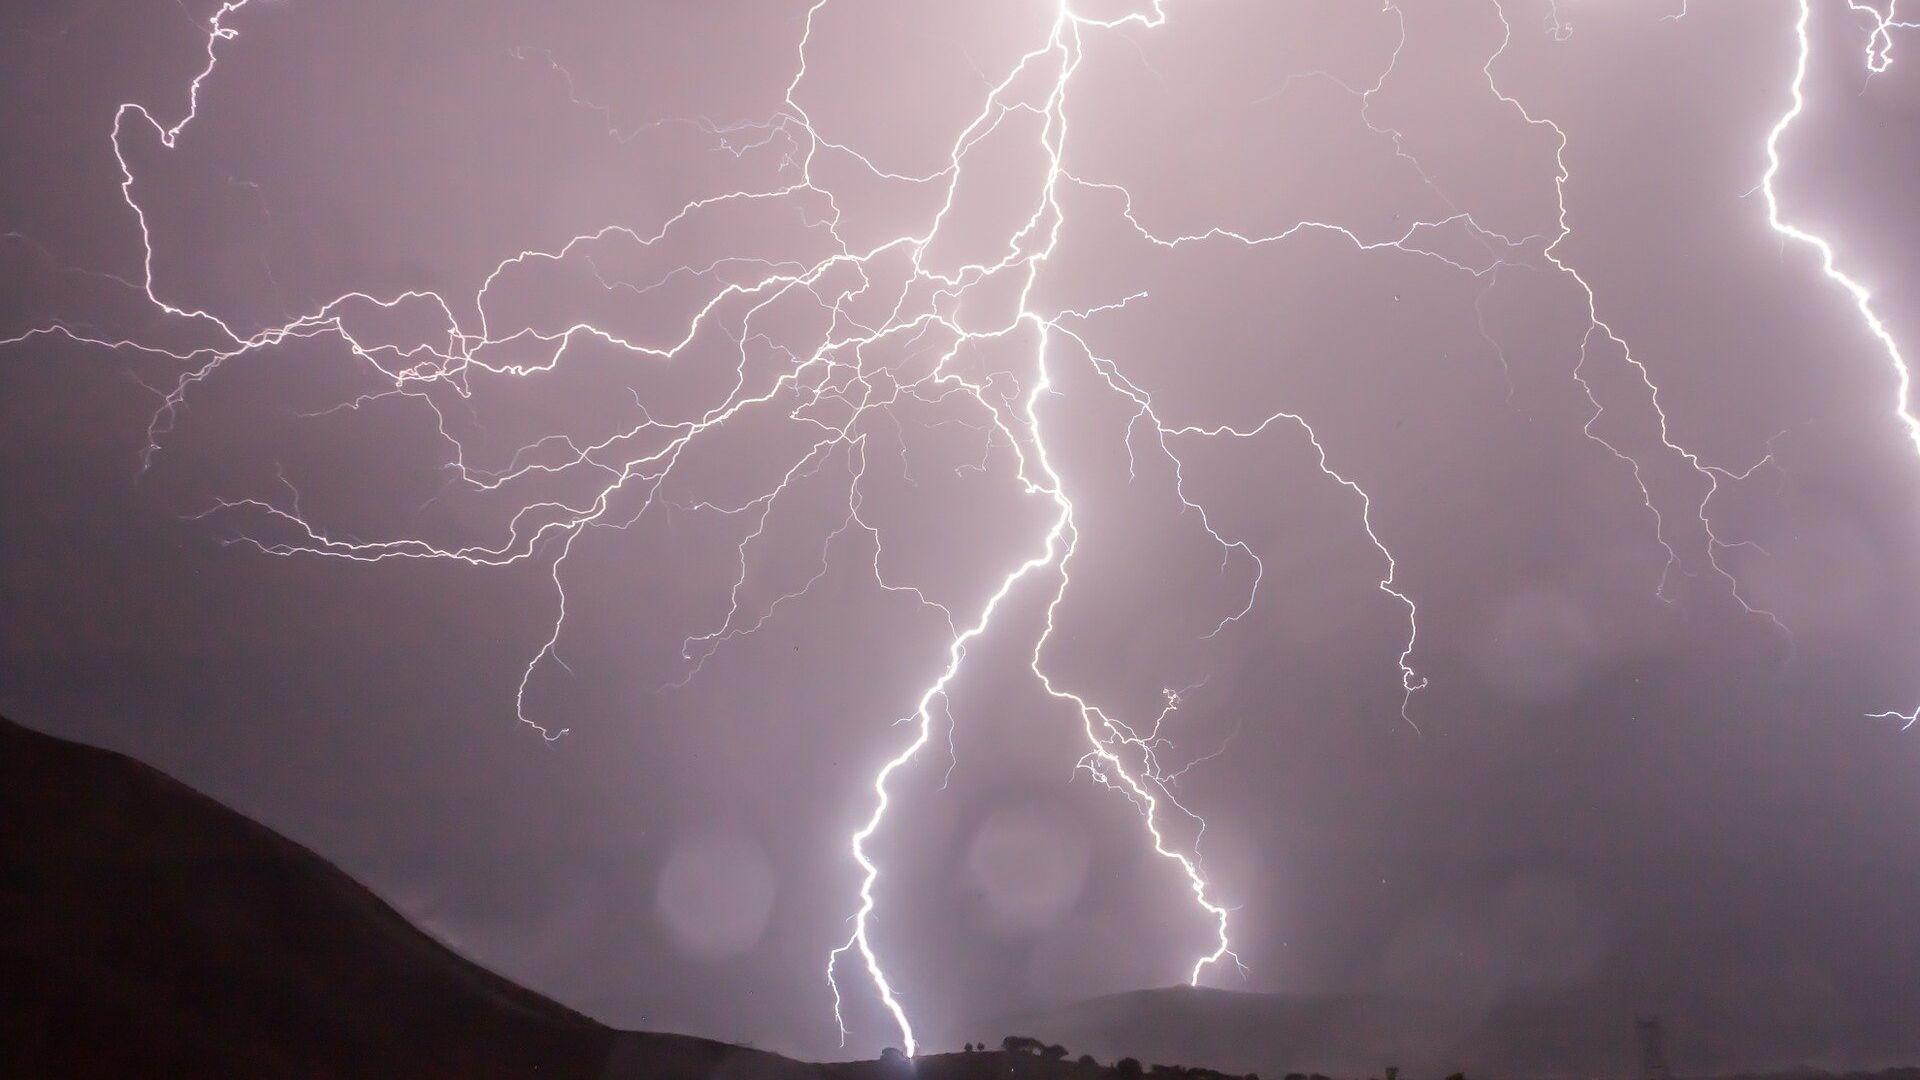 Una tormenta eléctrica (imagen referencial) - Sputnik Mundo, 1920, 18.05.2021